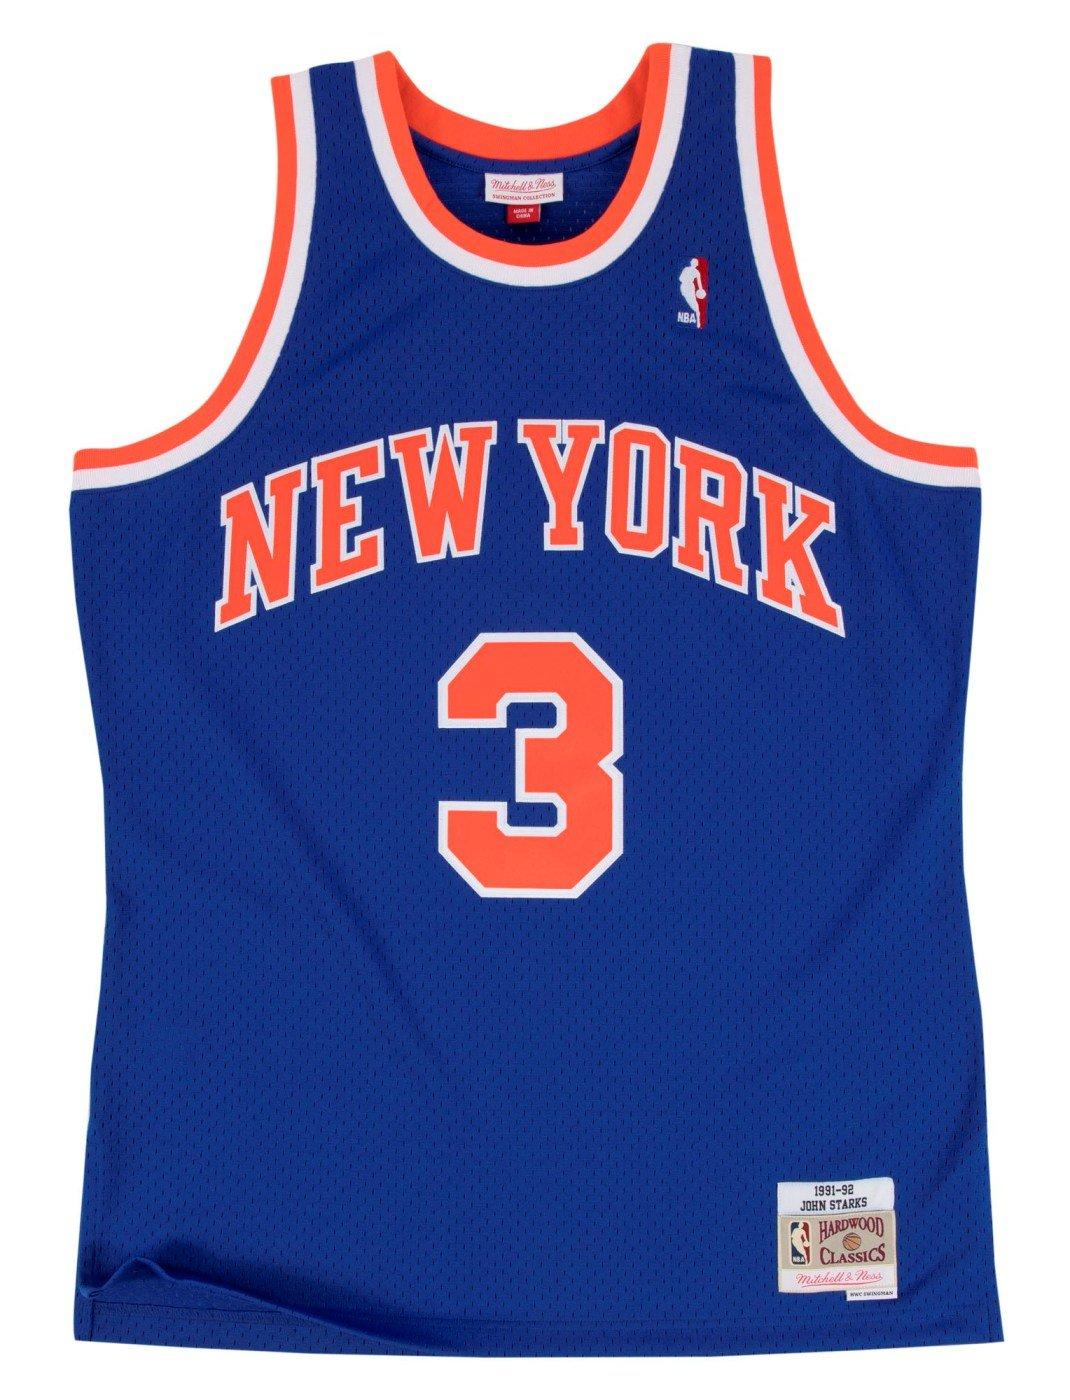 99e7d70581c Mitchell & Ness John Starks 1991-92 New York Knicks HWC Blue Swingman Jersey